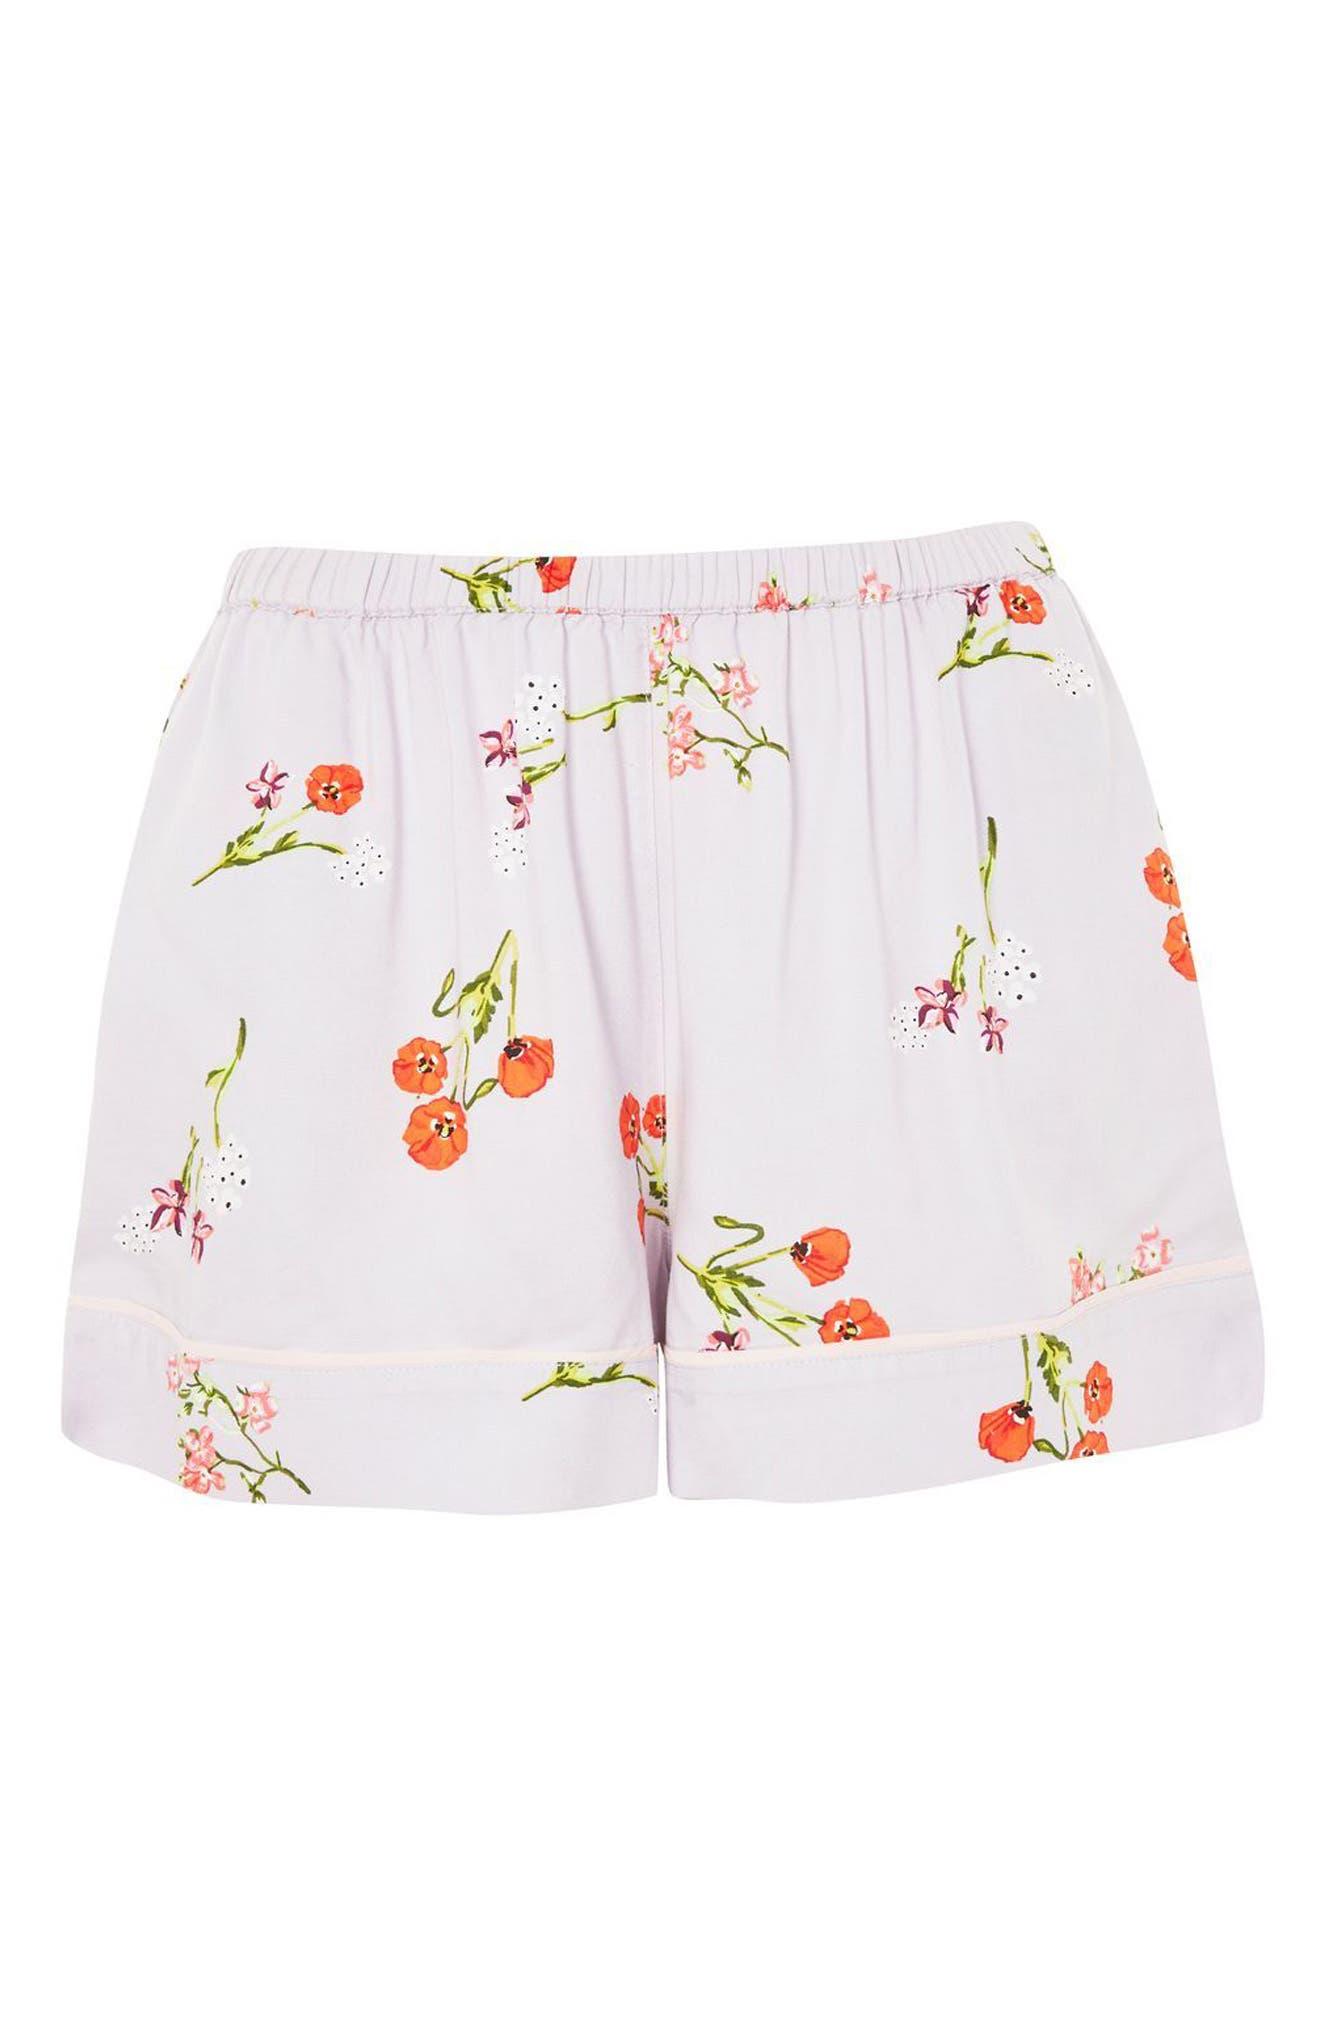 Poppy Pajama Shorts,                             Alternate thumbnail 3, color,